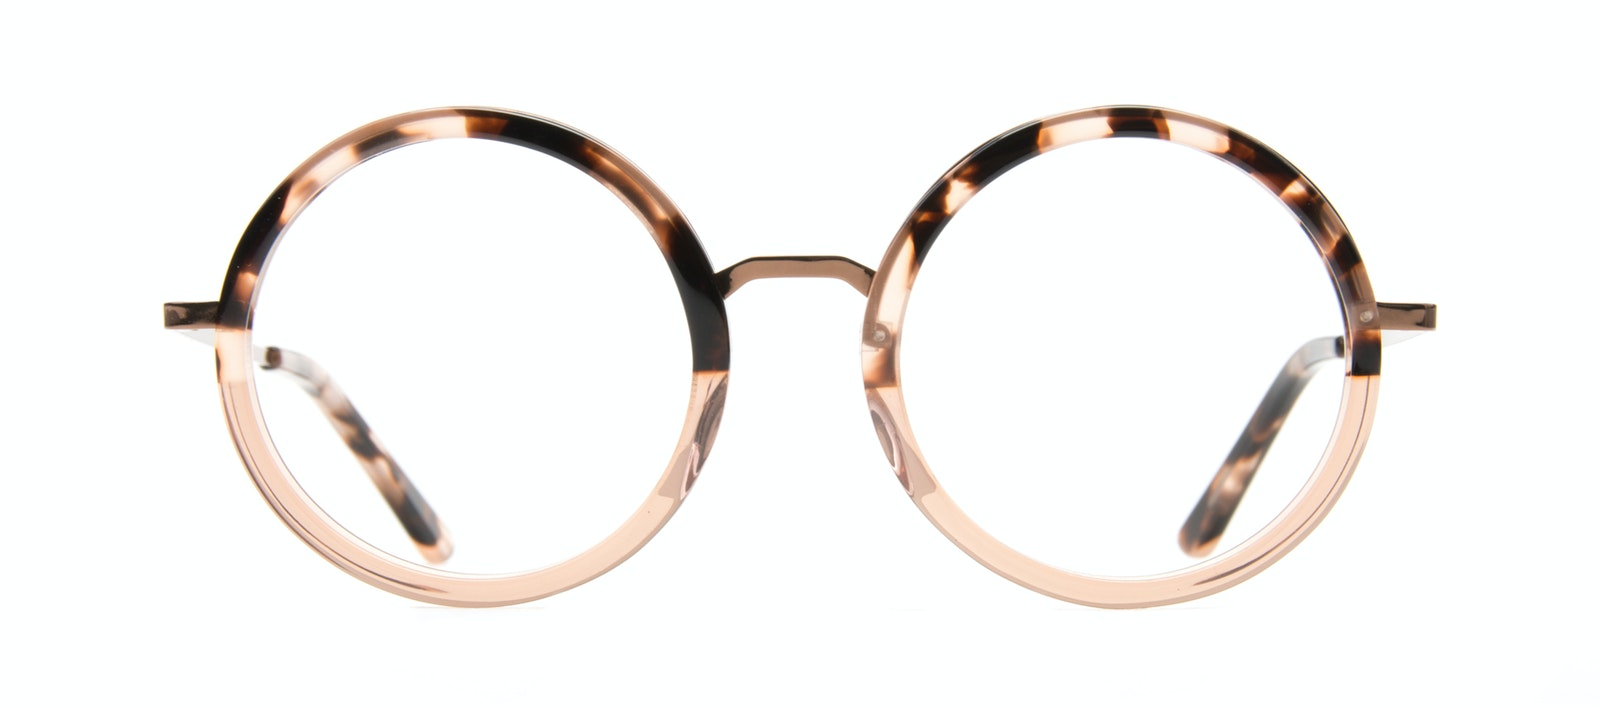 5645d2e170aa8 ... Affordable Fashion Glasses Round Eyeglasses Women Balance Rose Tortoise  Front ...